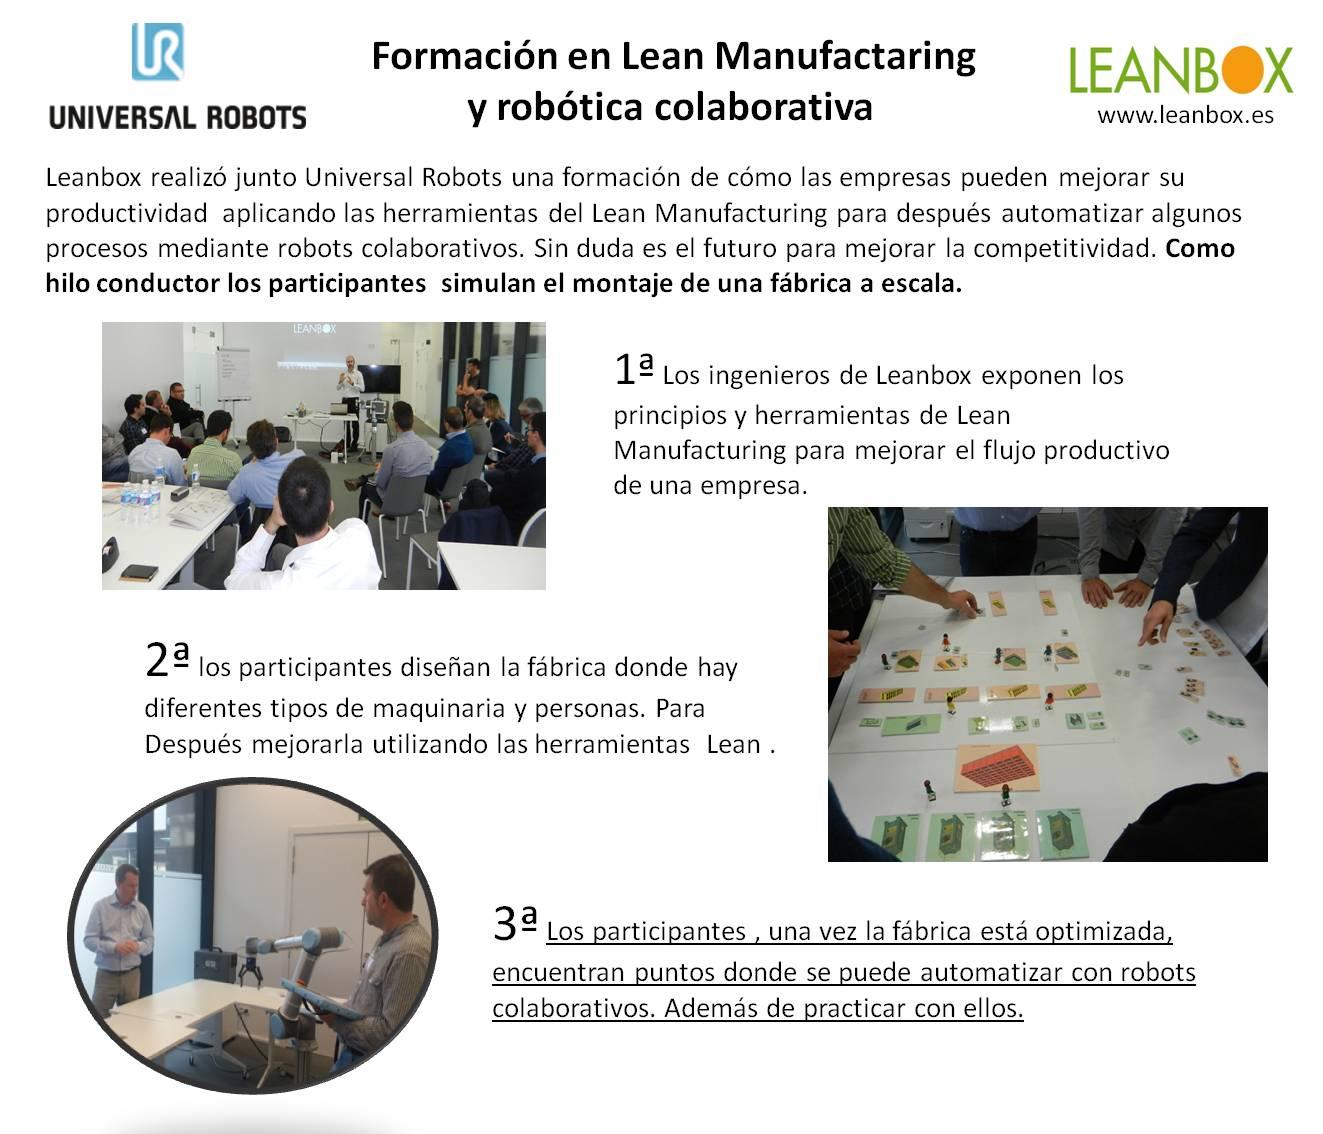 lean manufacturing y robotica colaborativa